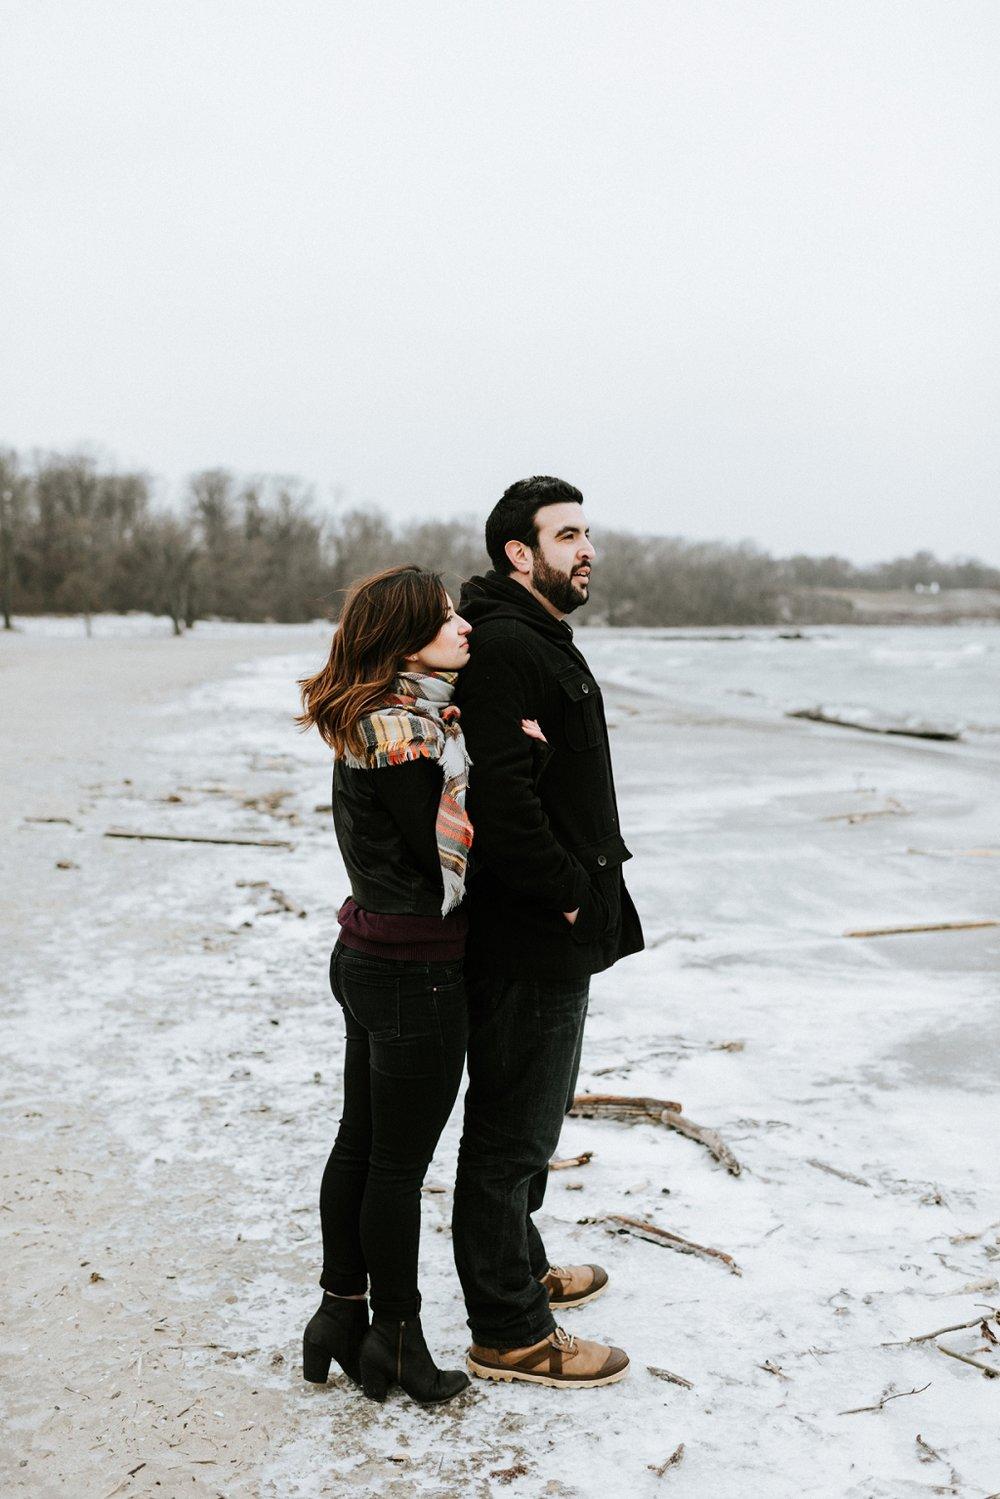 Rachel+Micheal_WinterbytheWater_MJPHOTO2017-59.jpg